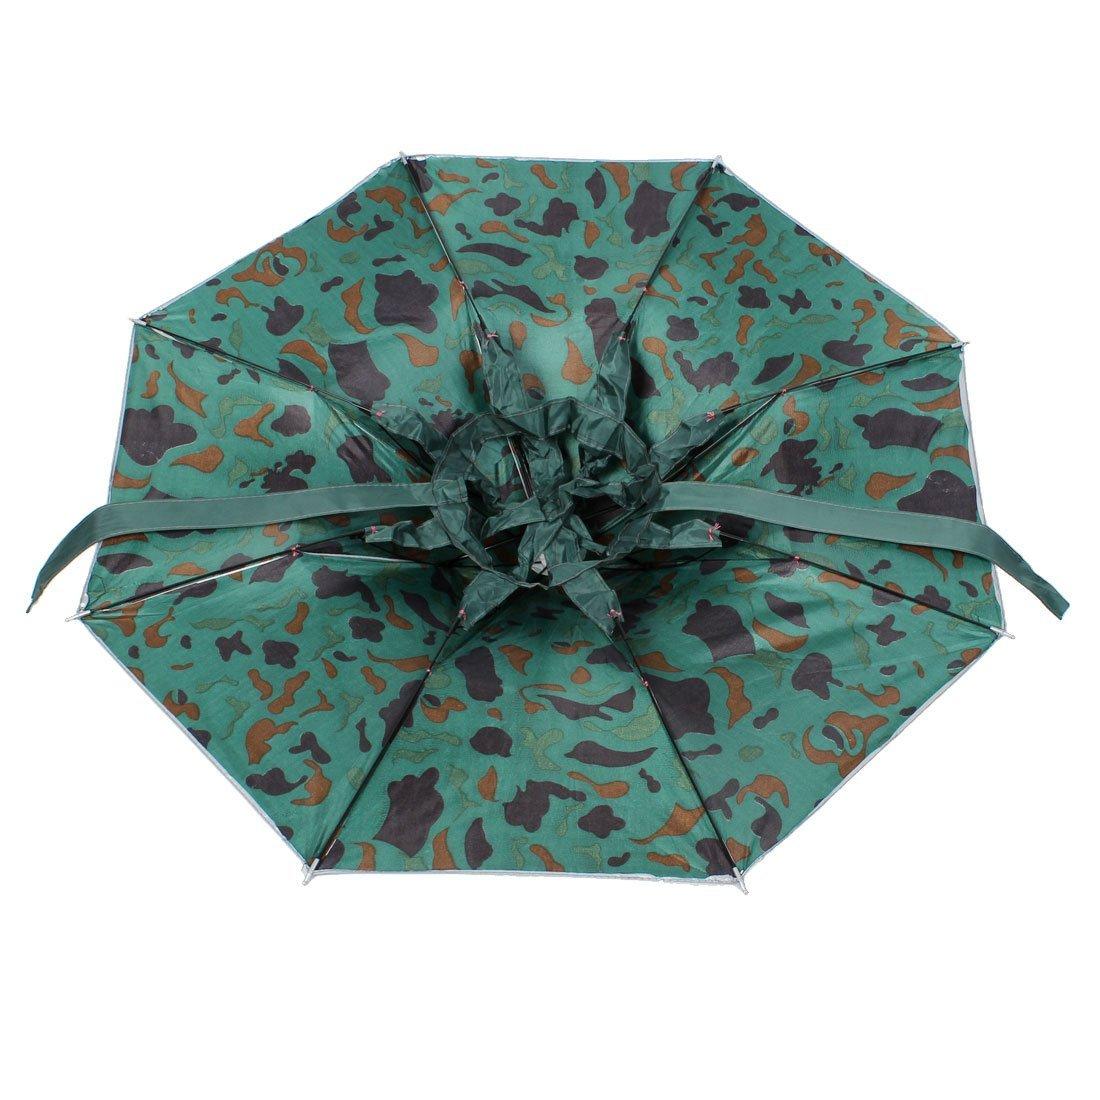 Amazon.com: eDealMax patrón de camuflaje al aire Libre Pesca Sombreros Paraguas Sombrero: Home & Kitchen